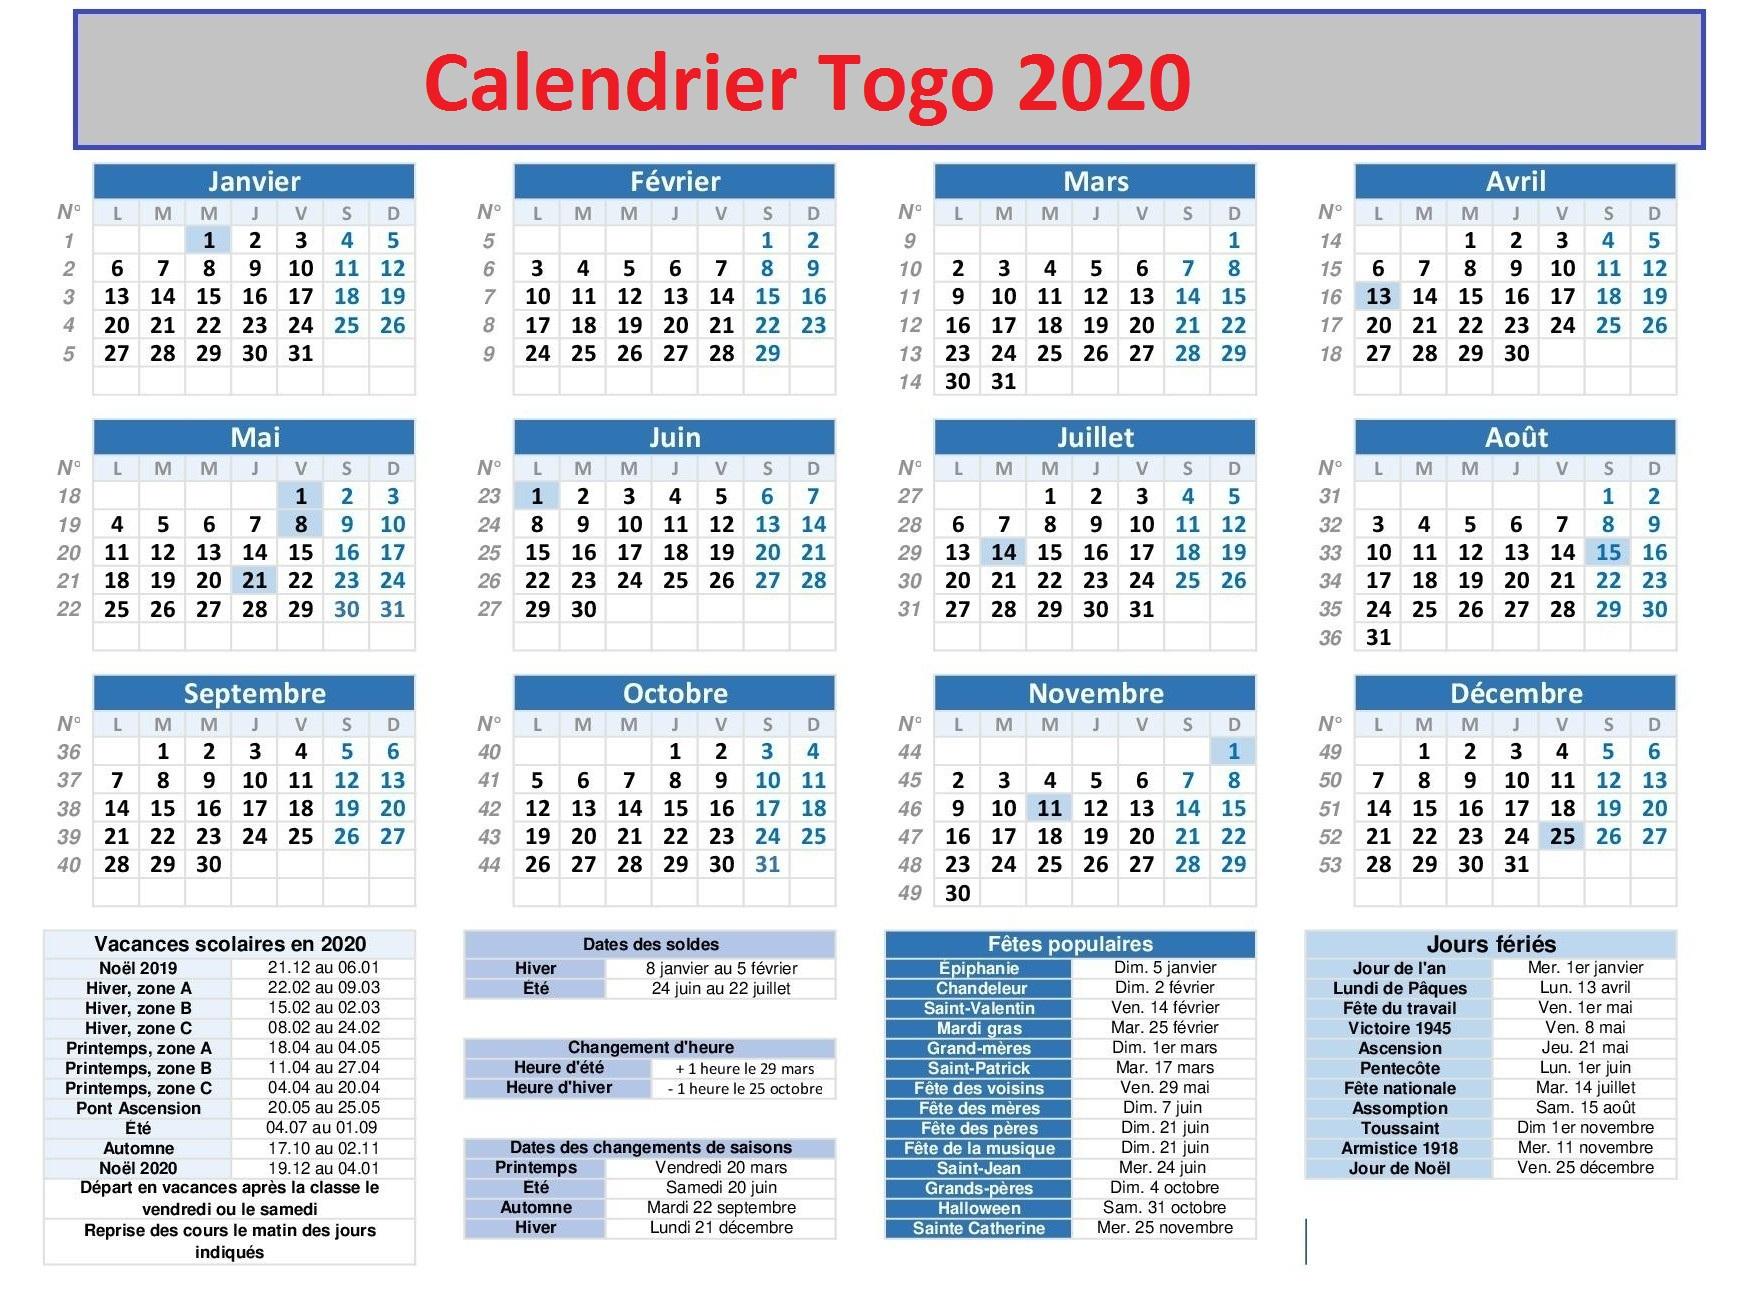 Calendrier Scolaire Togo 2020